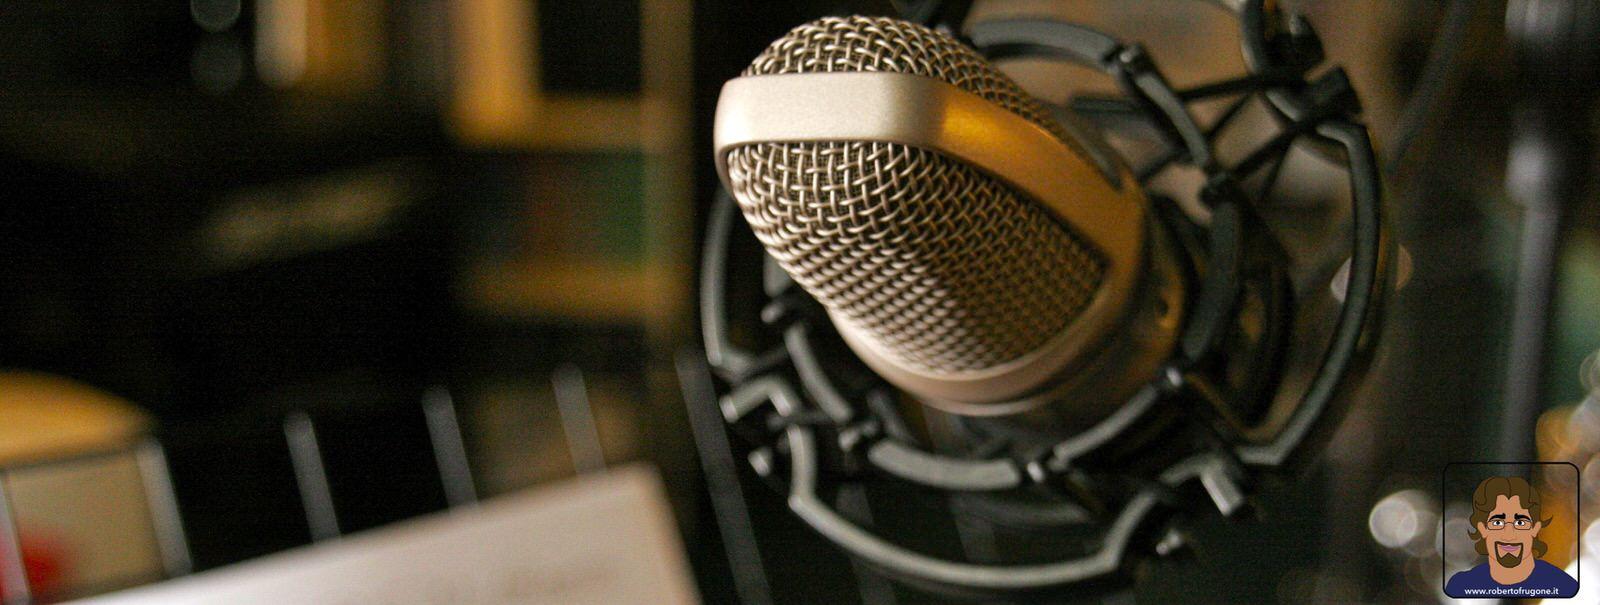 Totem Studio Sala Prove Musicali Casarza Ligure microfono AKG C3000 – foto Lamberto Salvan